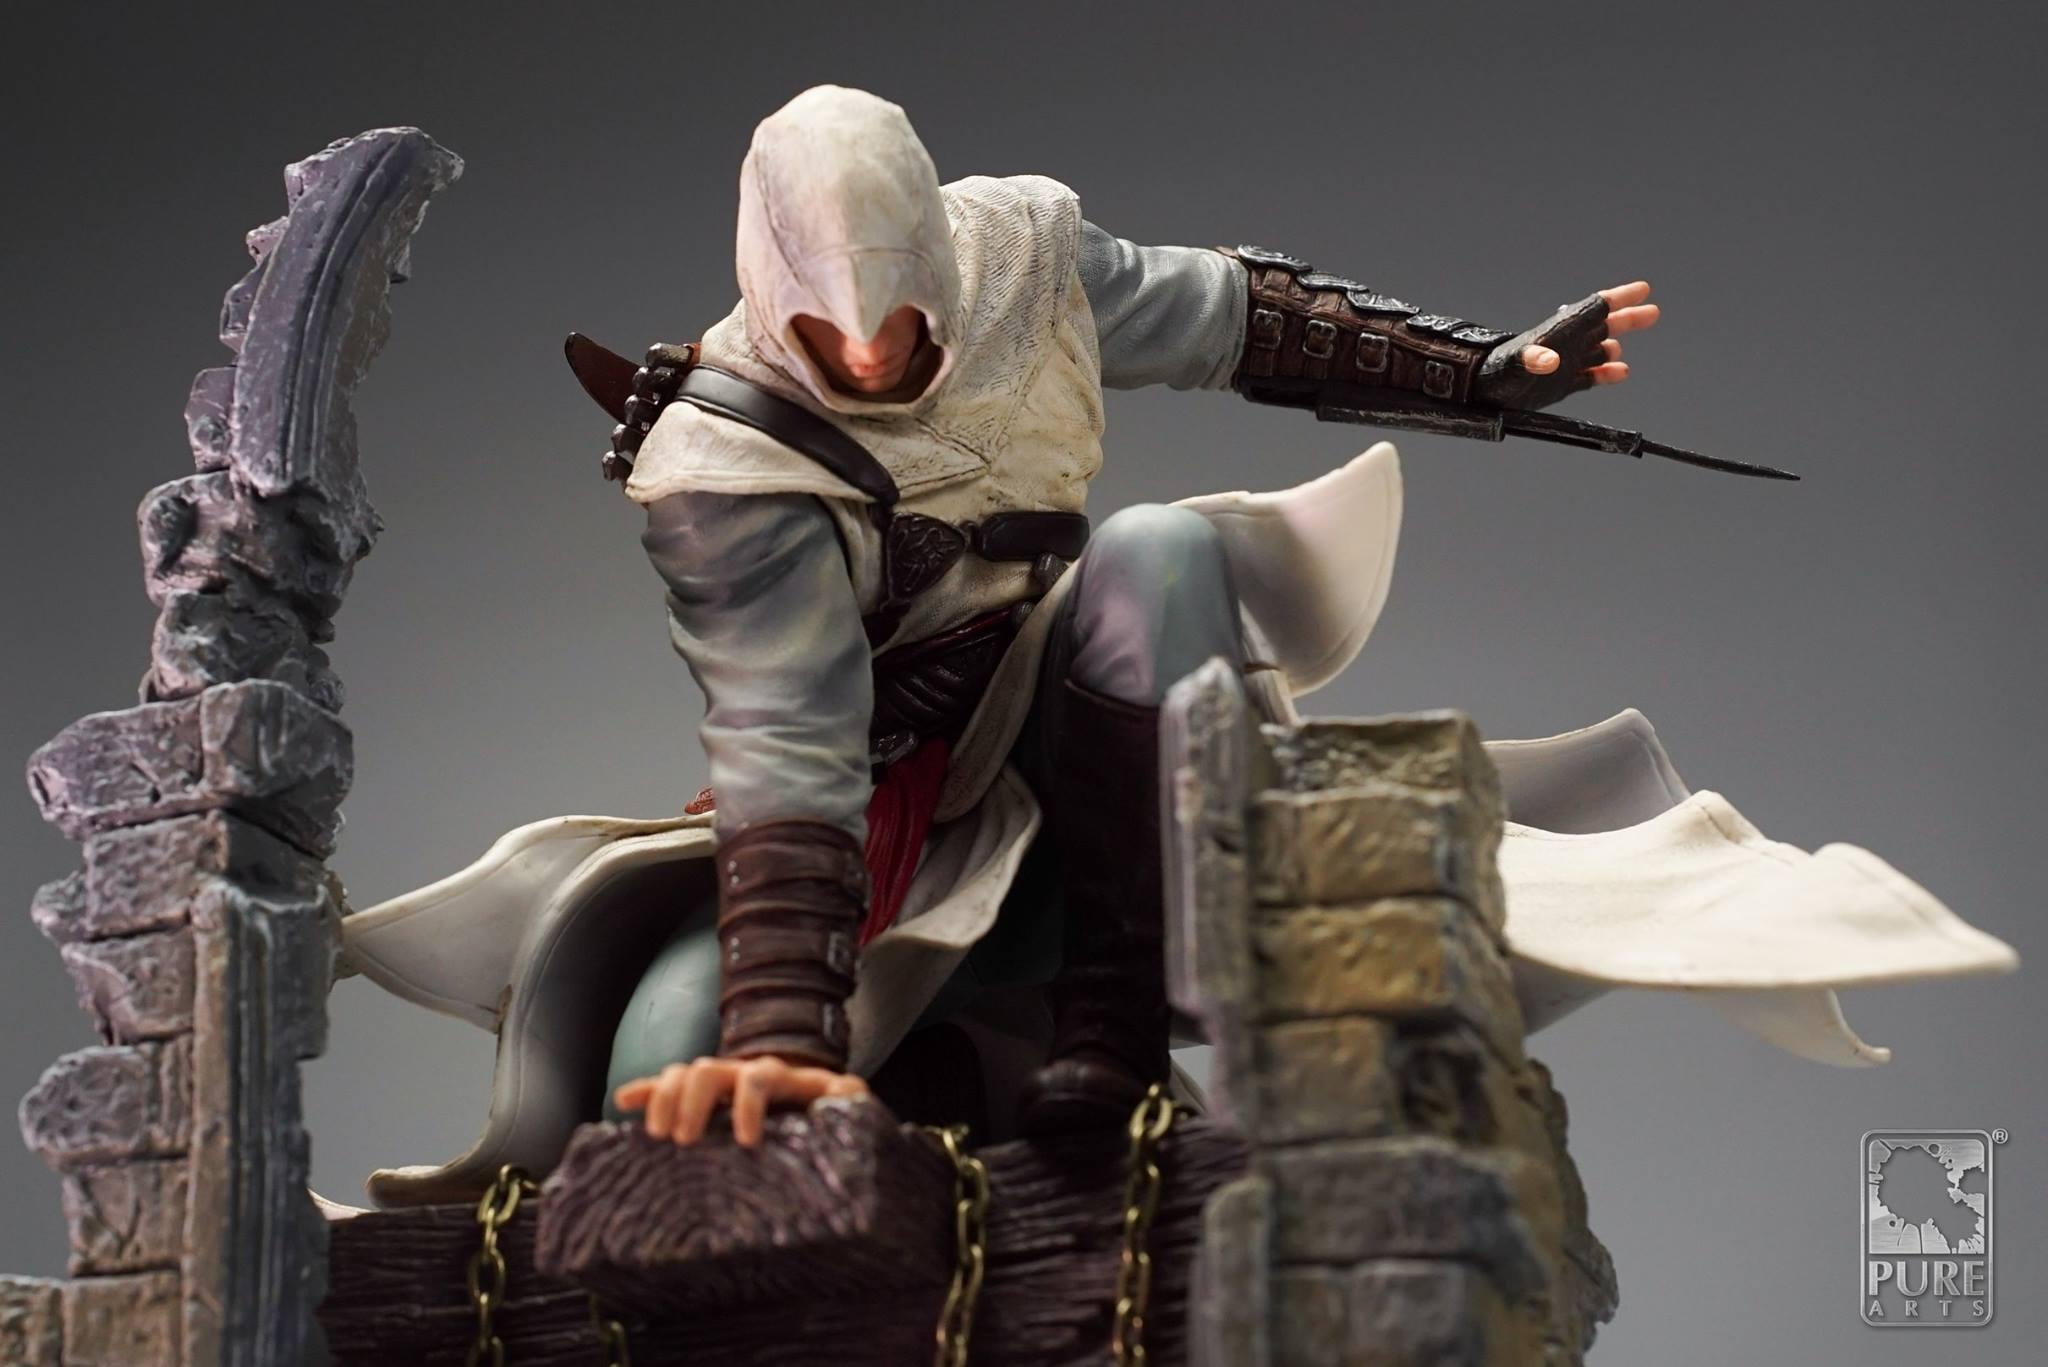 Altair The Legendary Assassin